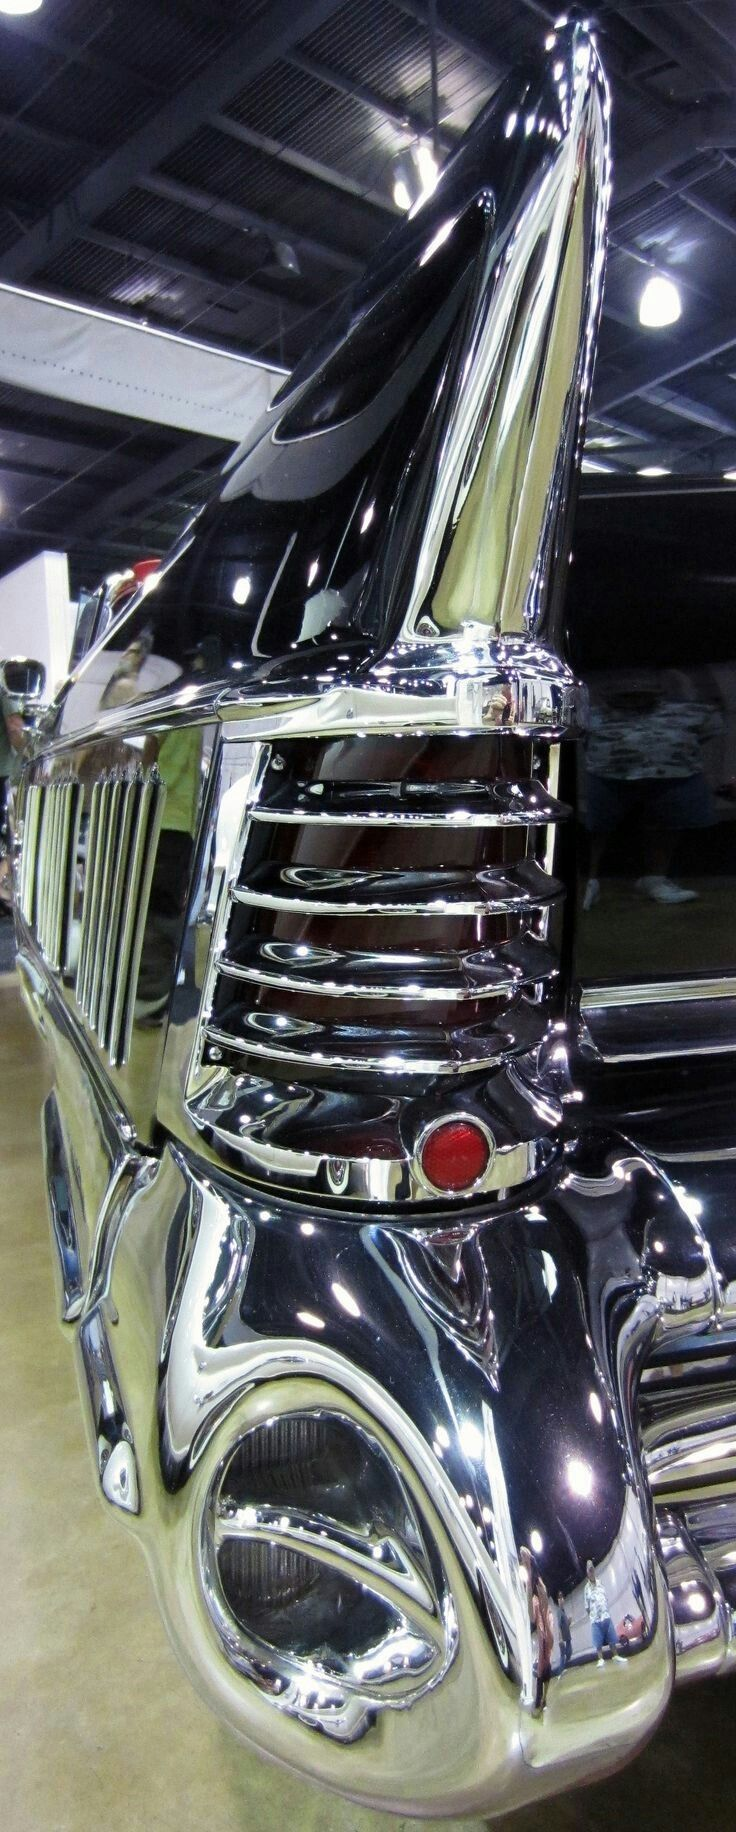 3126 best Cars & such images on Pinterest | Antique cars, Vintage ...